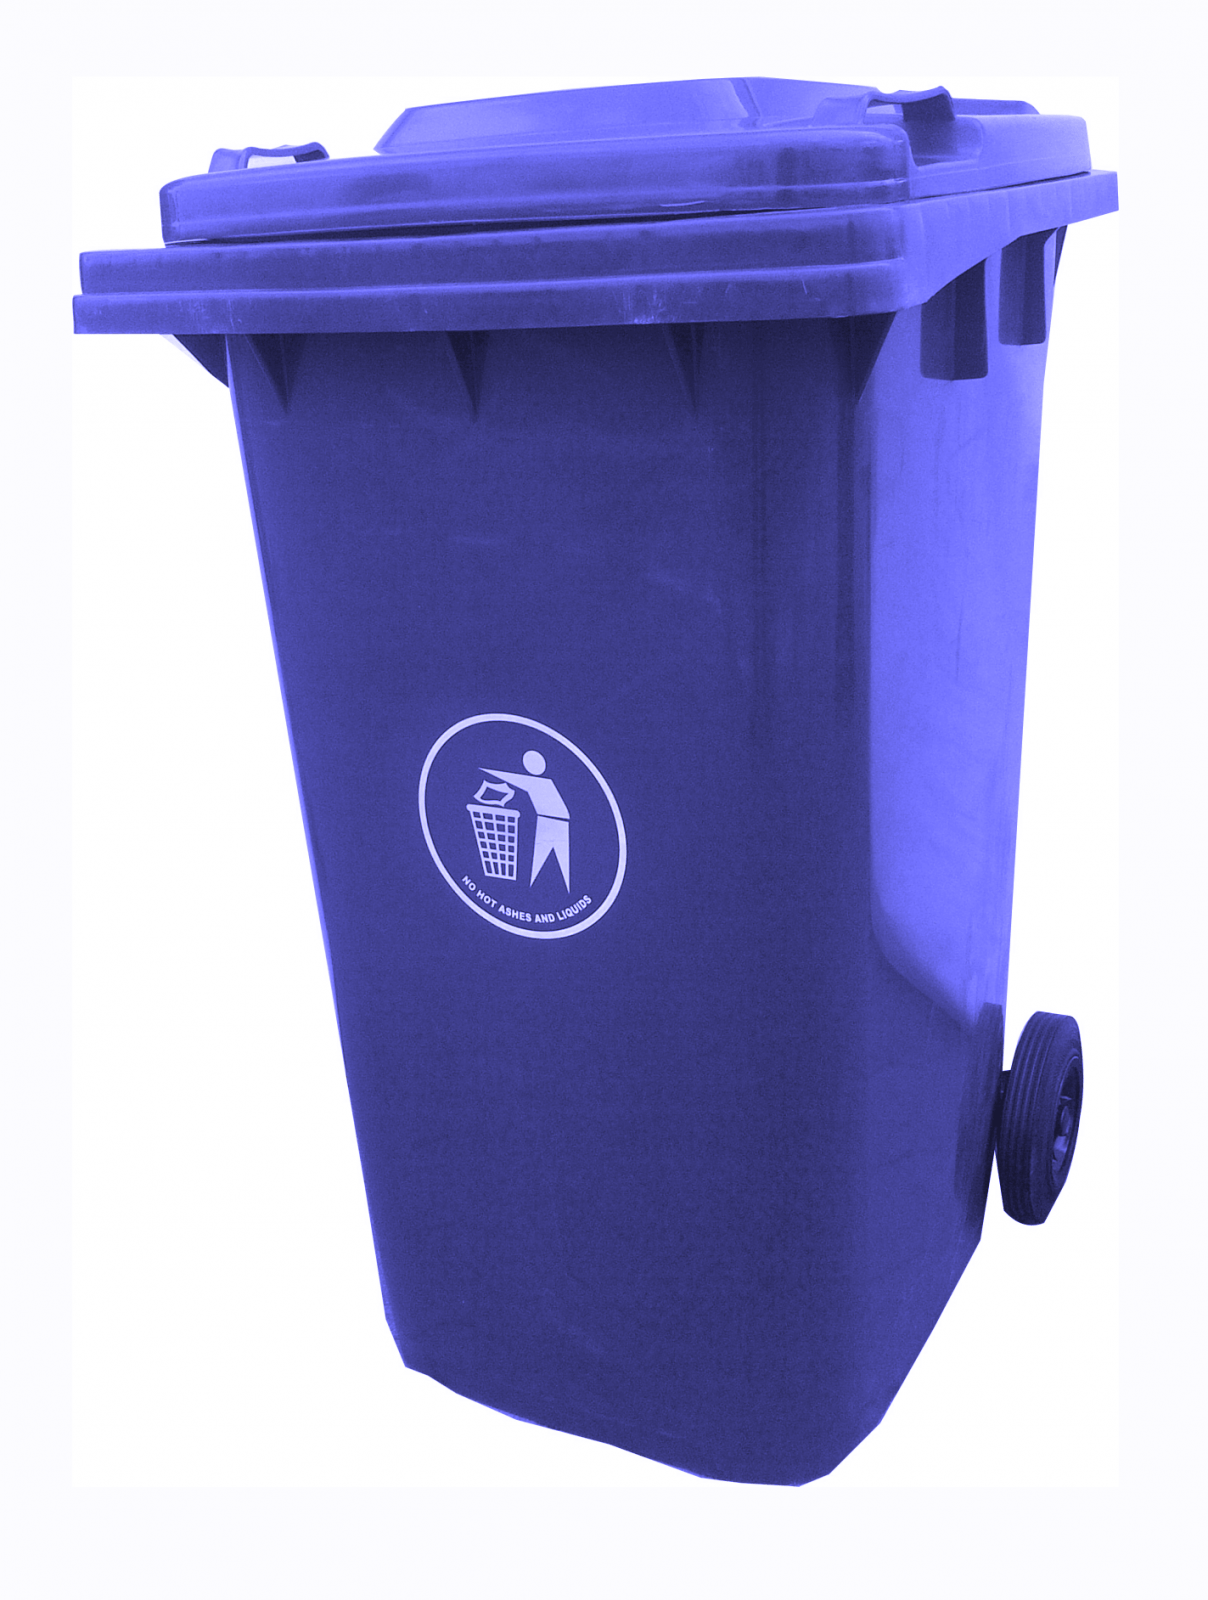 240 Litres Bayplast Plastic Wheelie Waste Bin Deep Green • Alfim Nigeria Limited